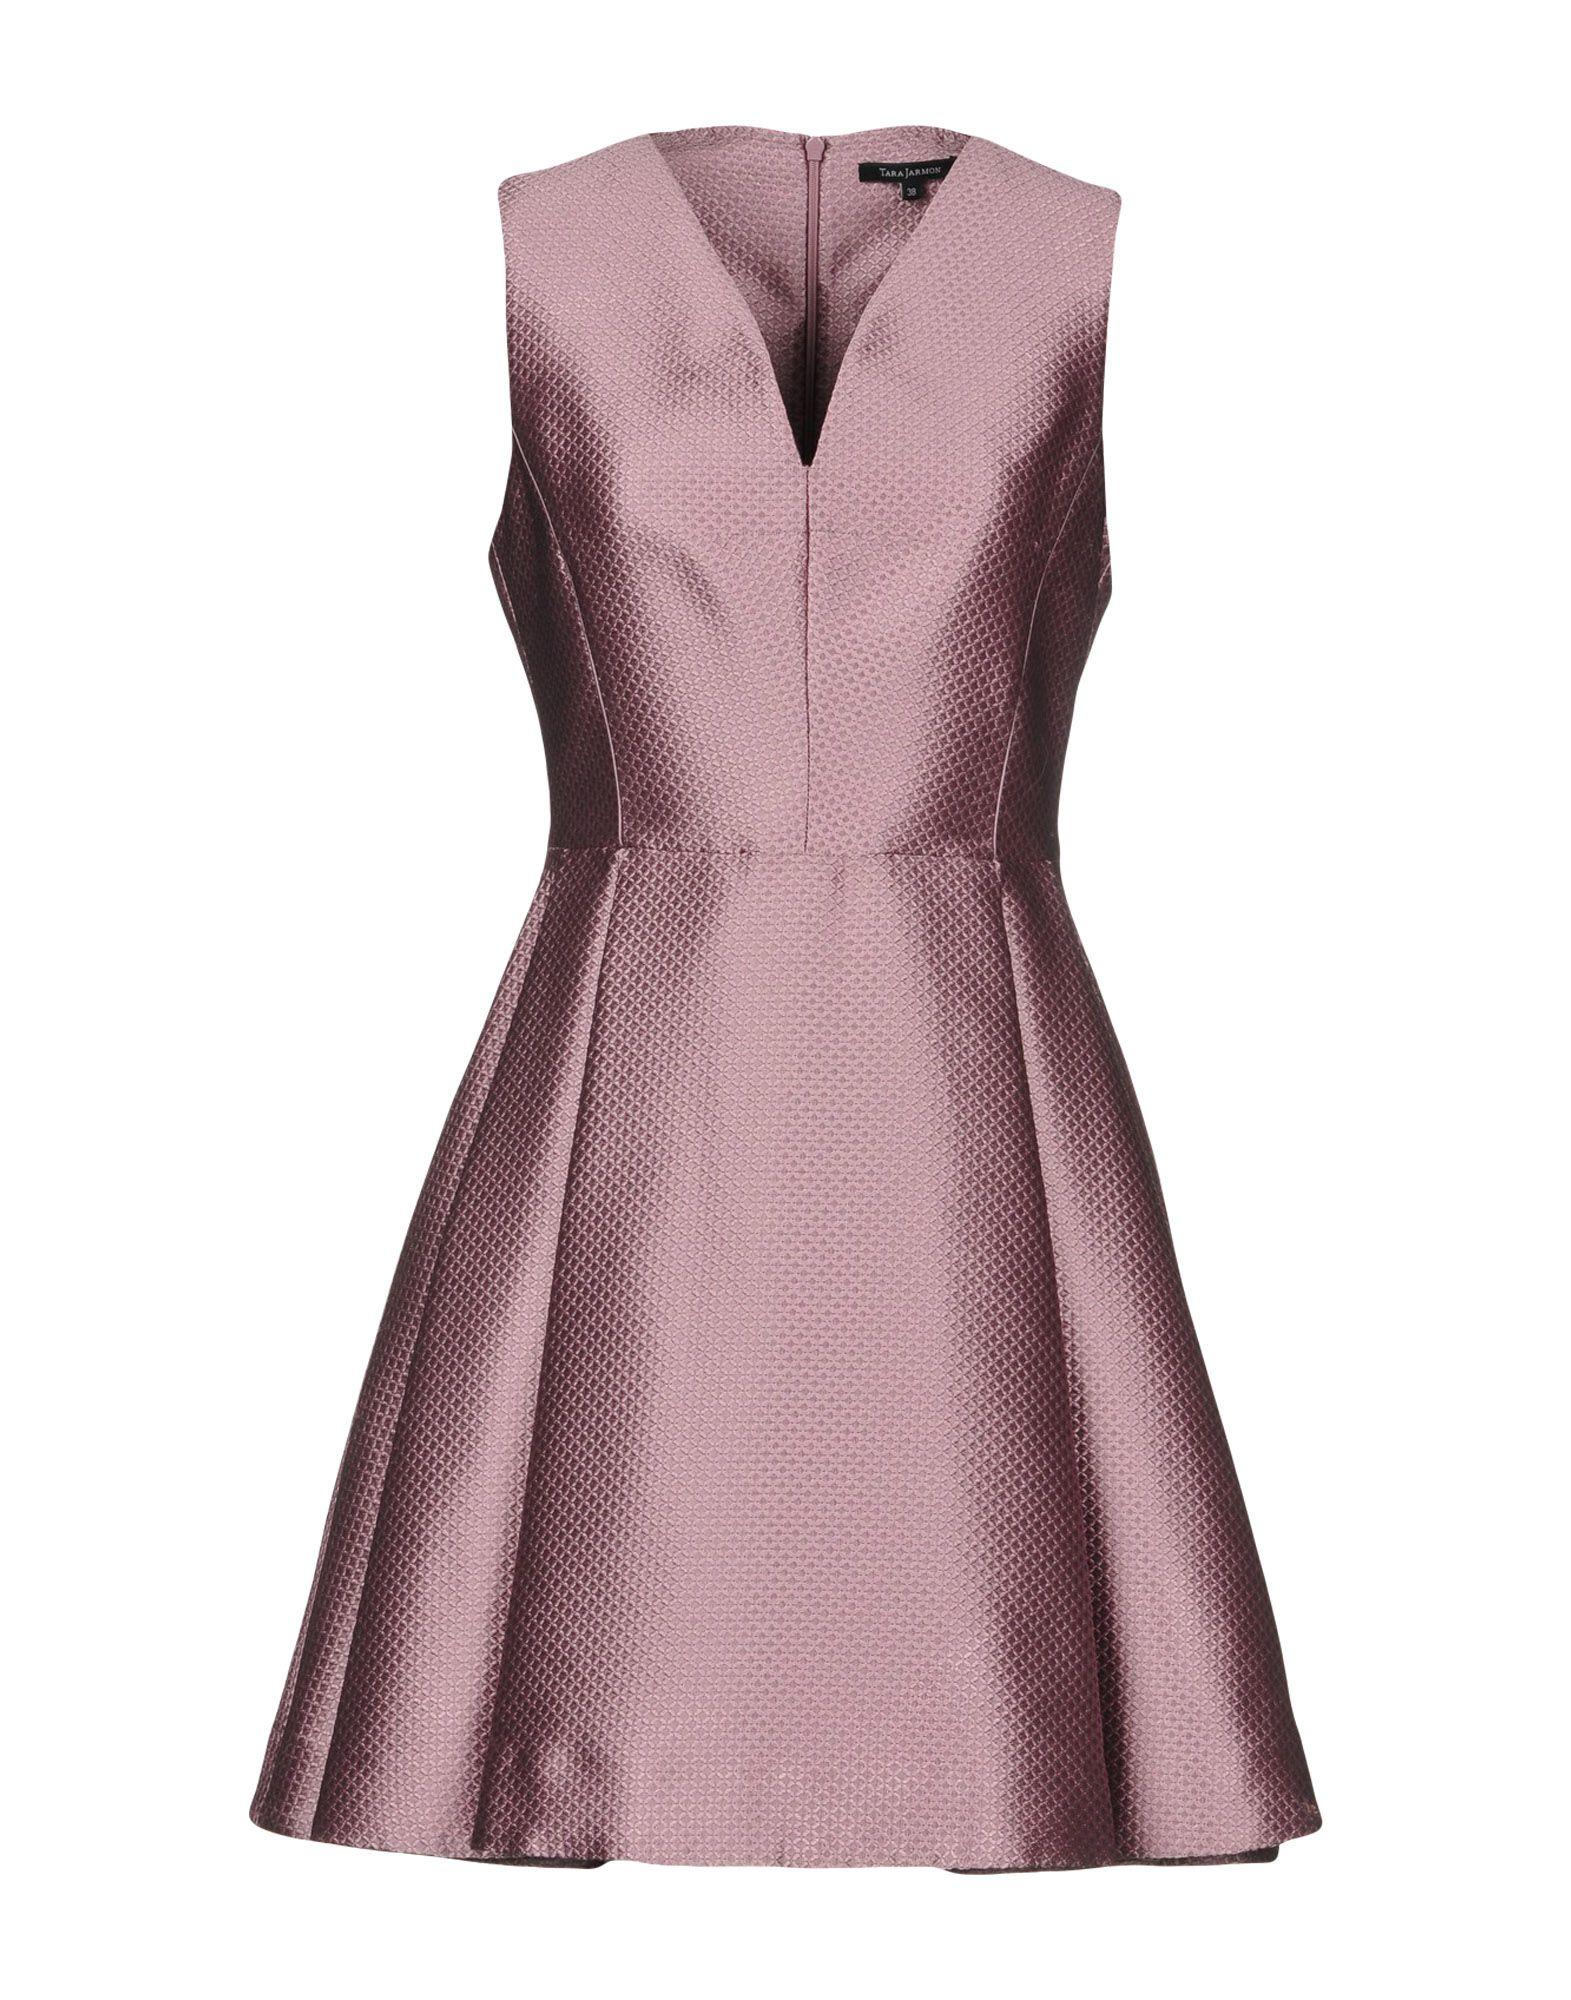 TARA JARMON Short Dress in Lilac